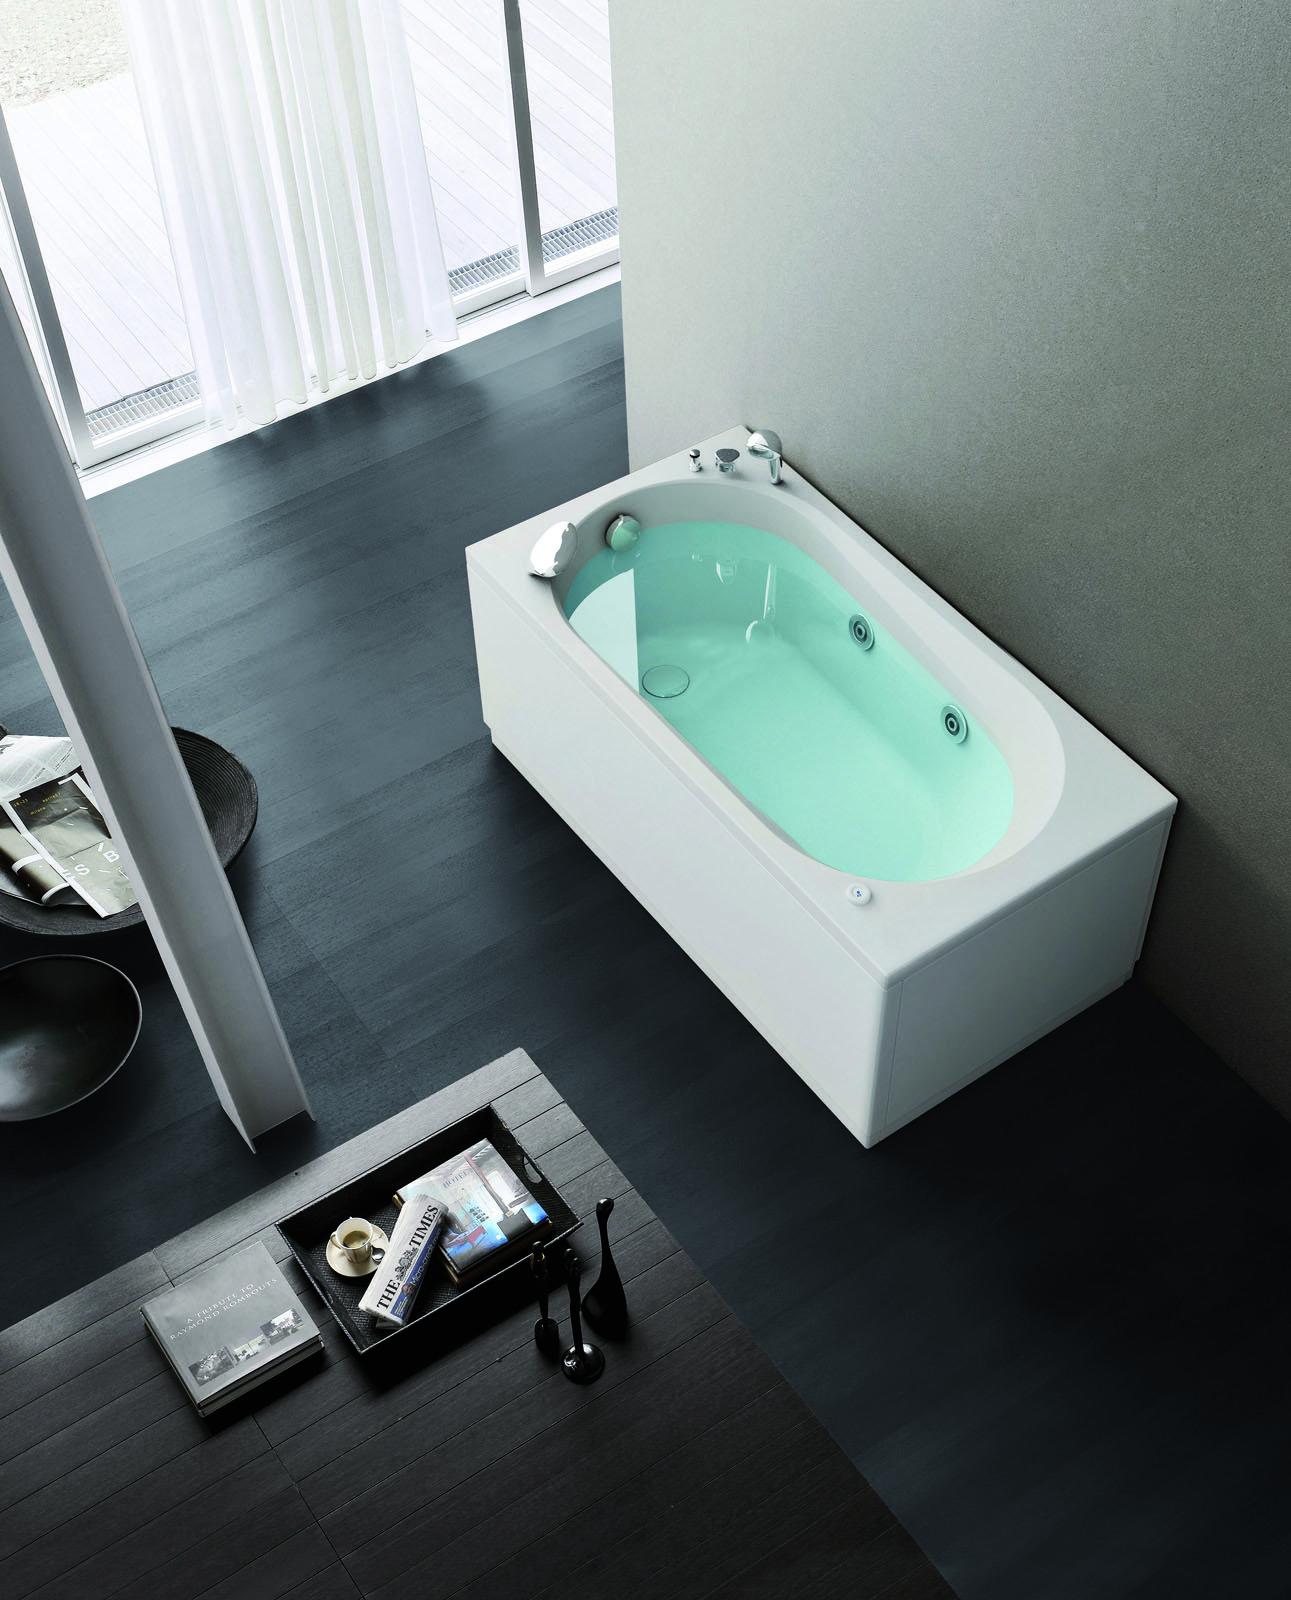 Vasche da bagno piccole cose di casa - Vasche da bagno misure ridotte ...